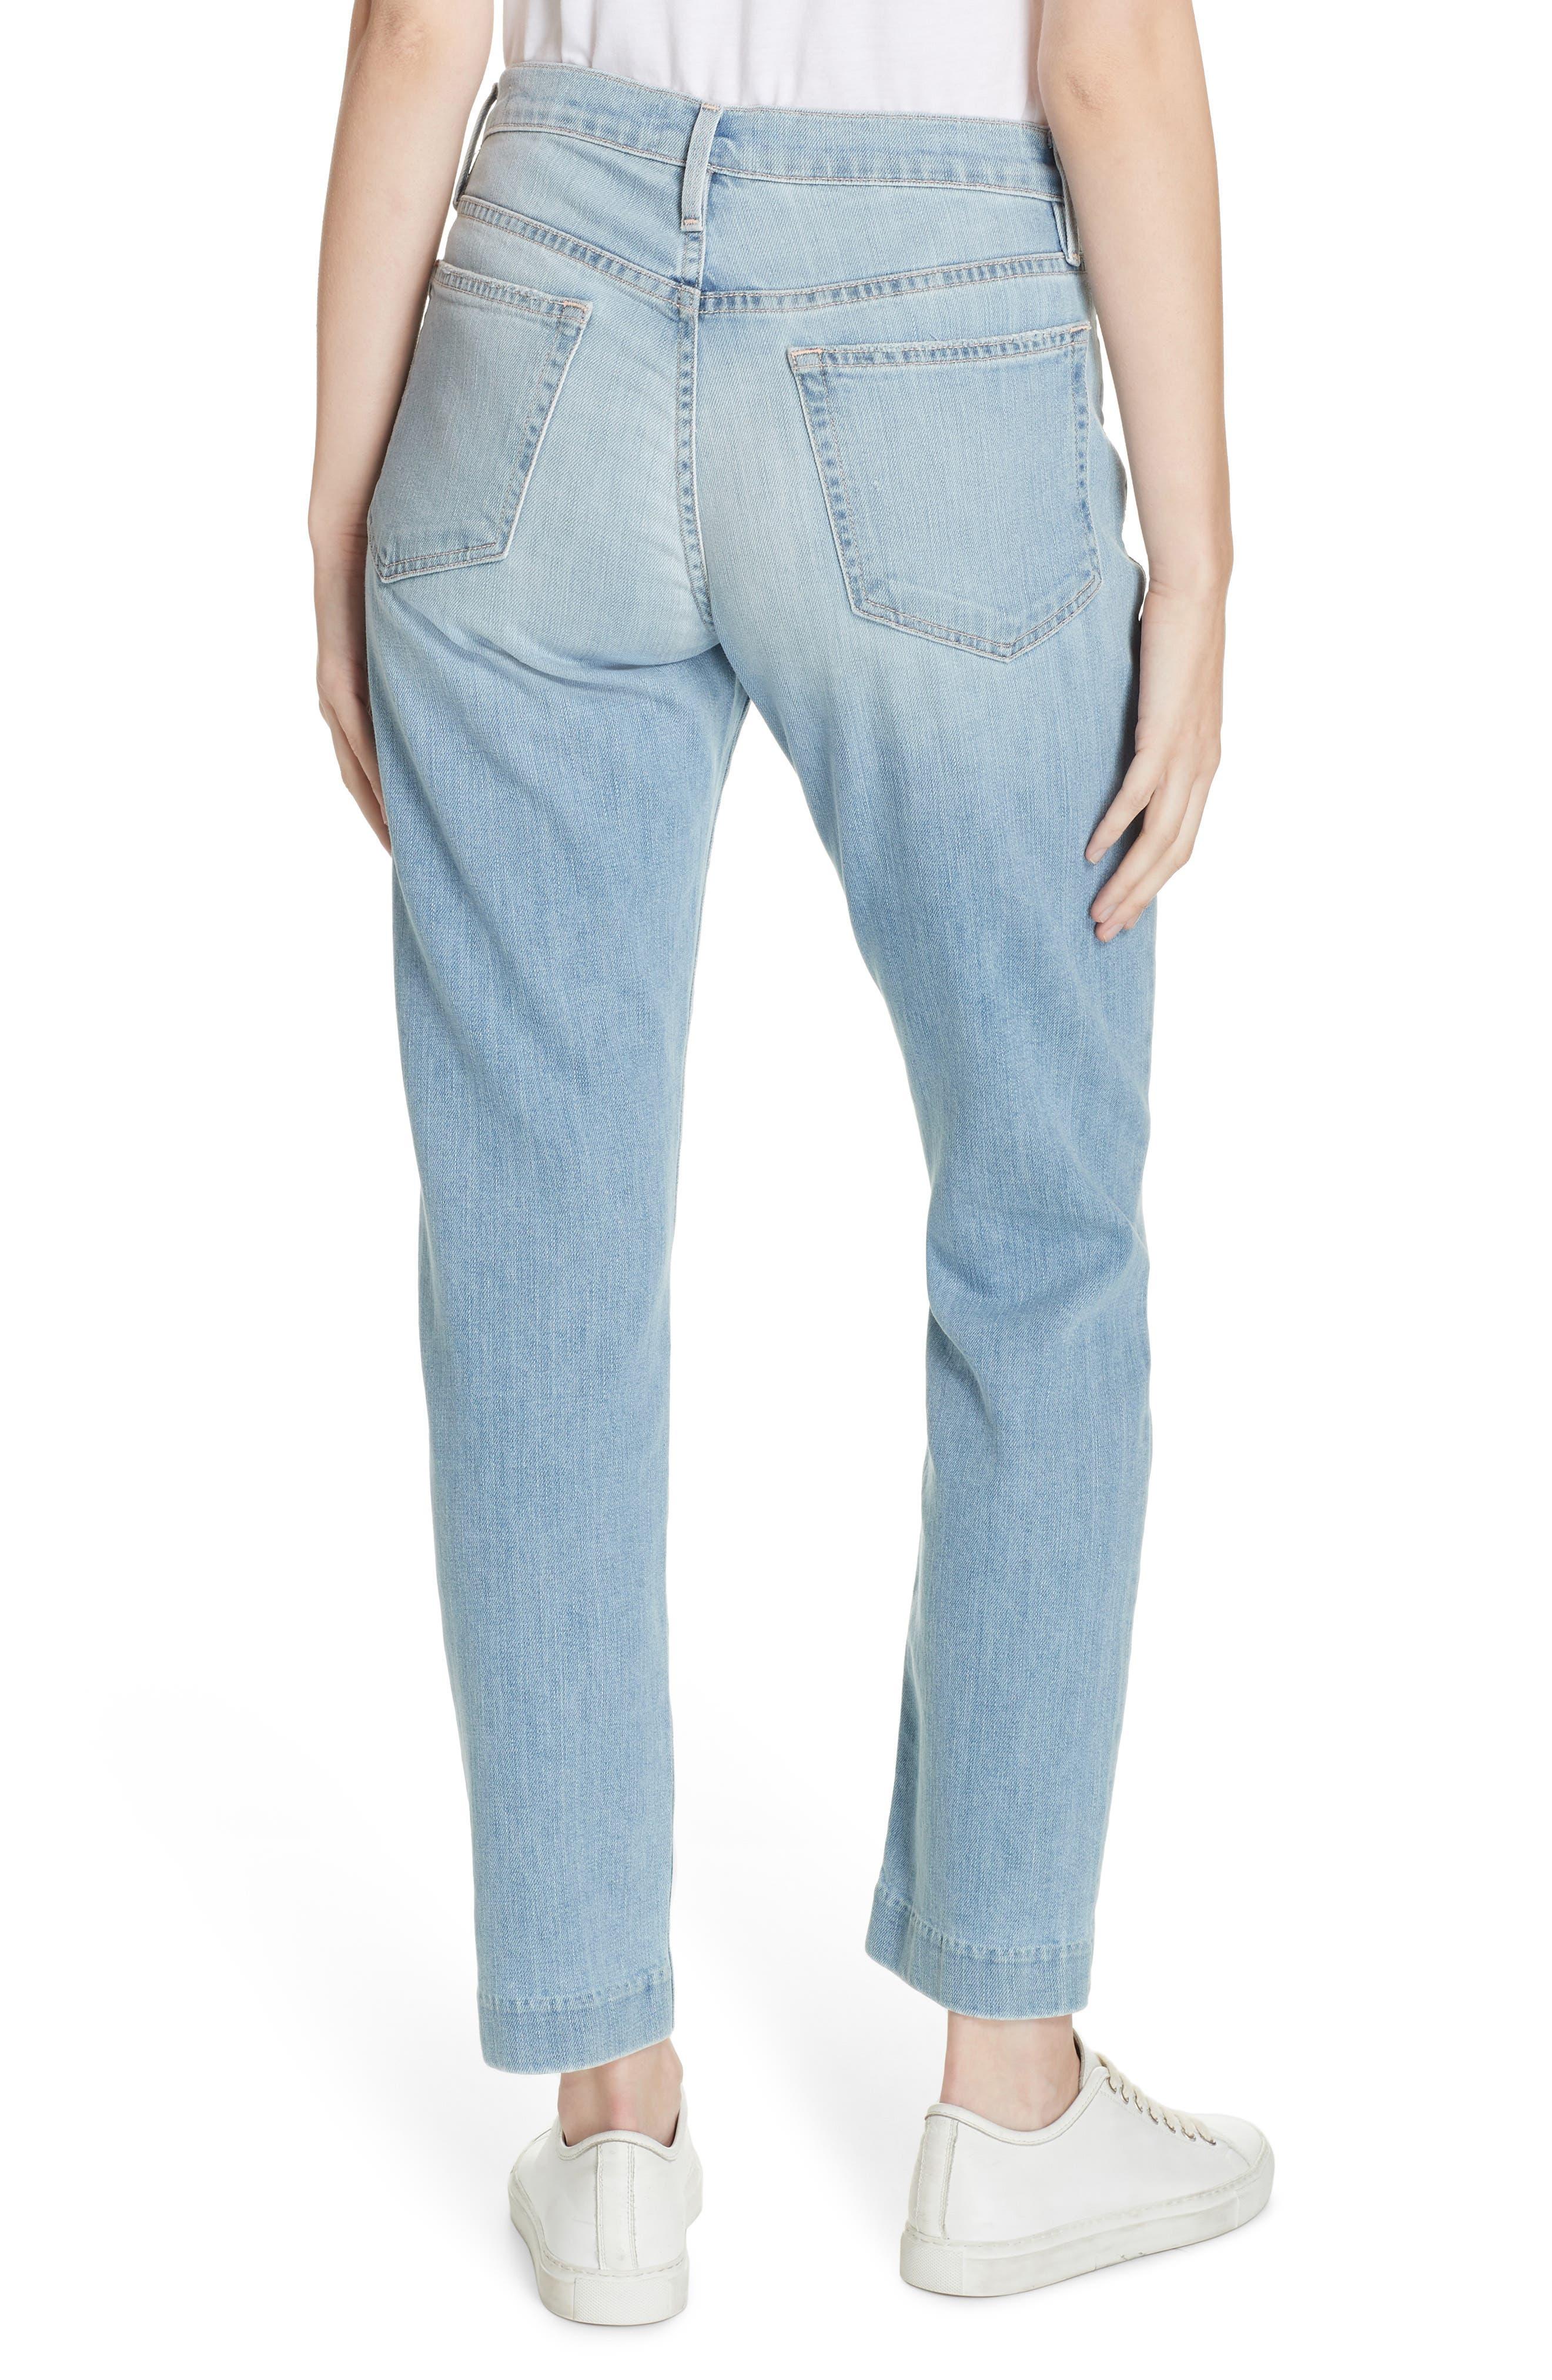 Le Boy High Waist Jeans,                             Alternate thumbnail 2, color,                             KEATON